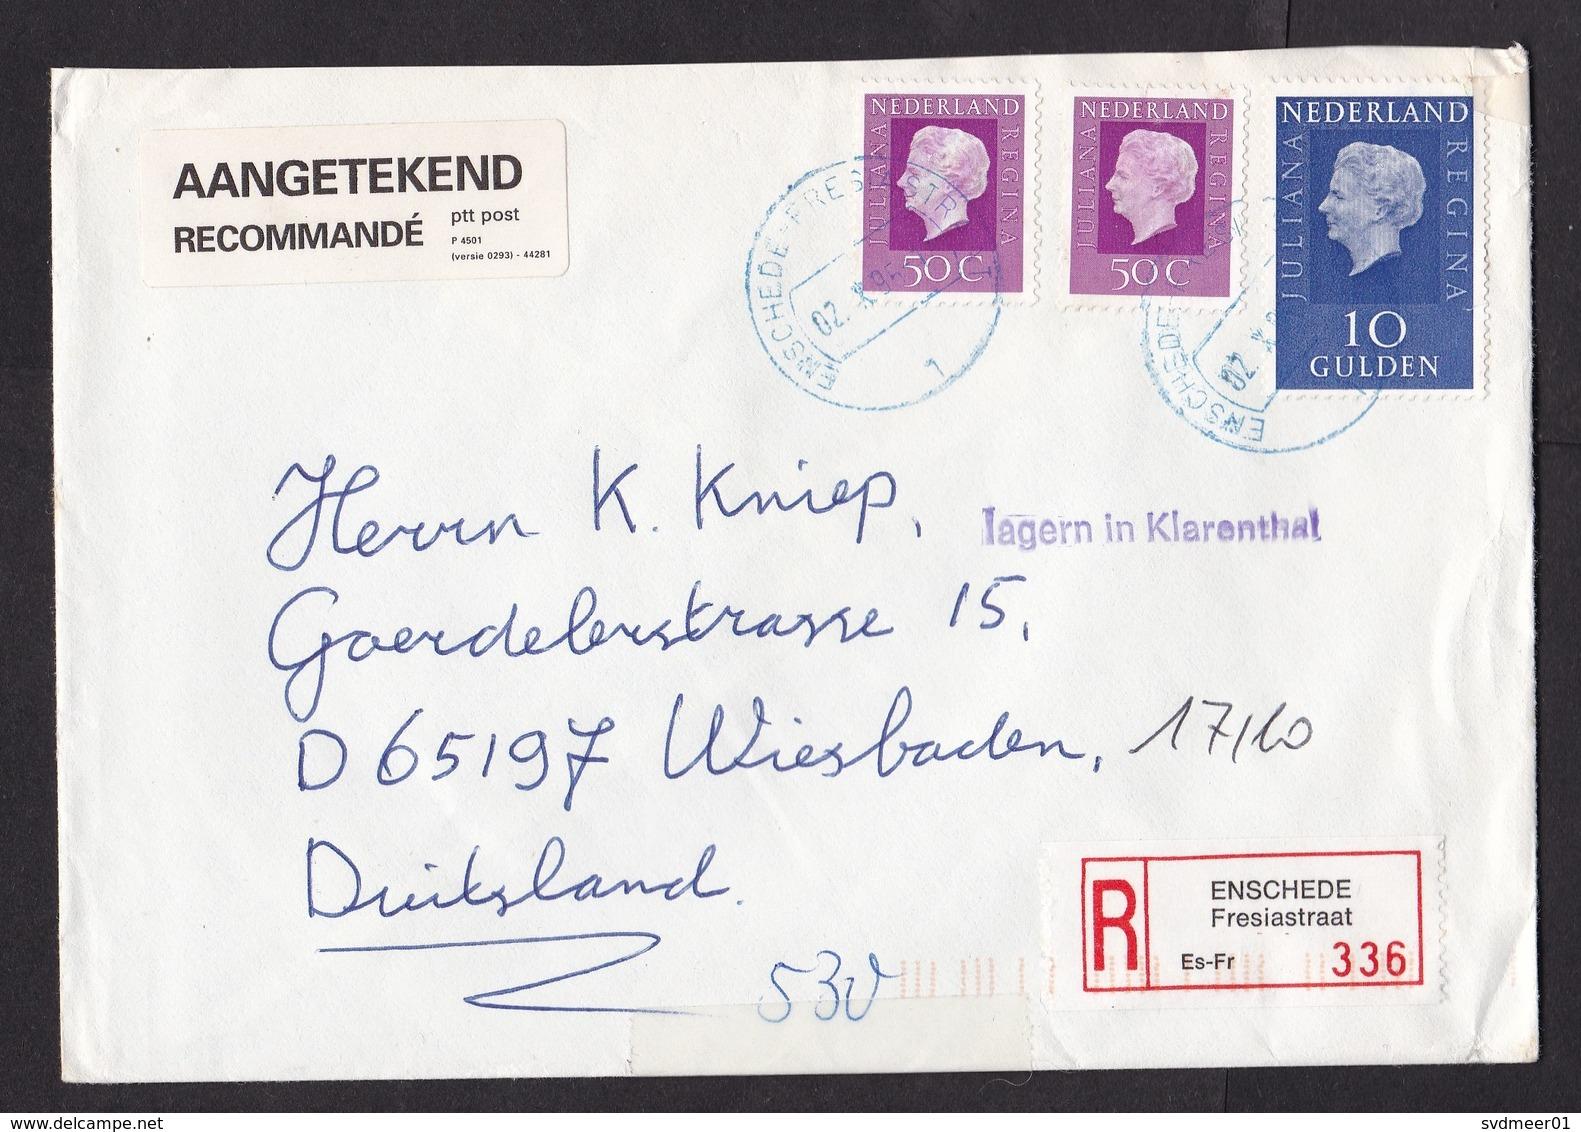 Netherlands: Registered Cover, 1995, 3 Stamps, R-label, Blue Cancel Enschede Fresiastraat, Auxiliary Mark (minor Damage) - Brieven En Documenten